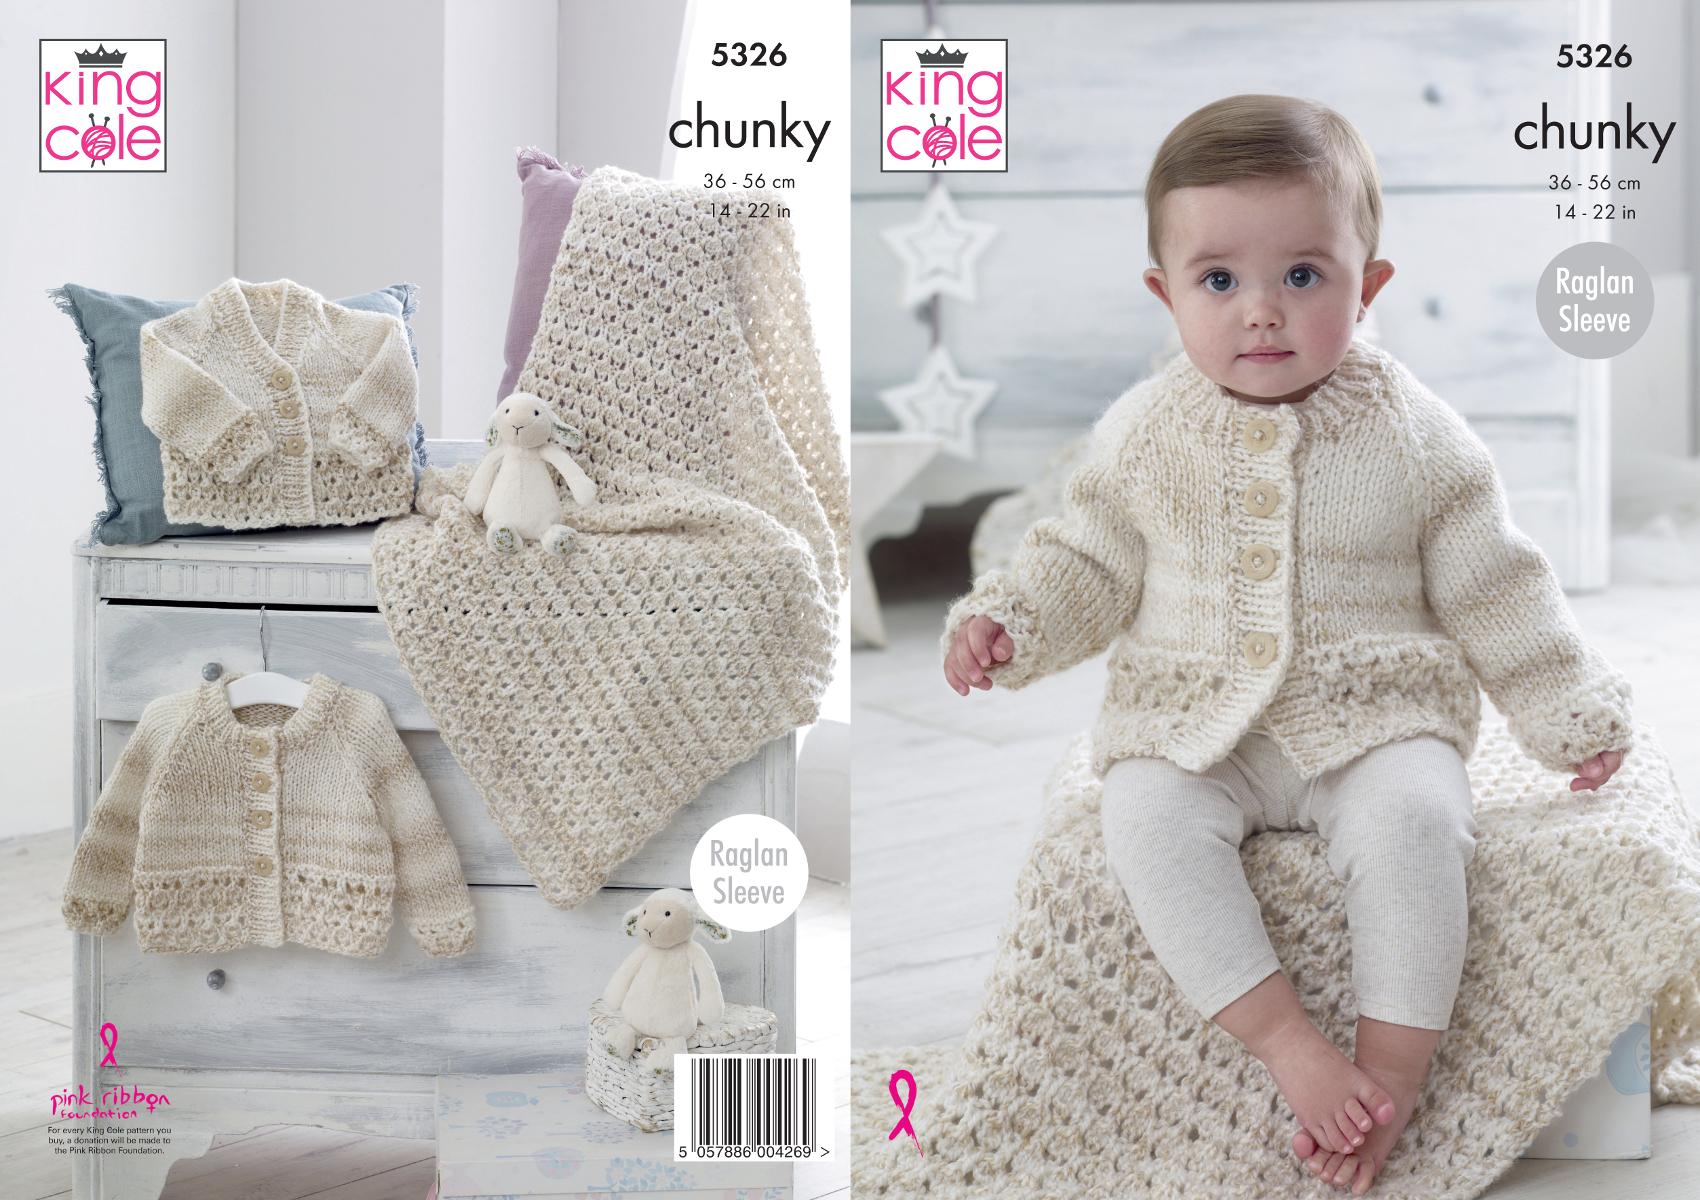 King Cole Baby Chunky Knitting Pattern Raglan Sleeve Cardigans /& Blanket 5326